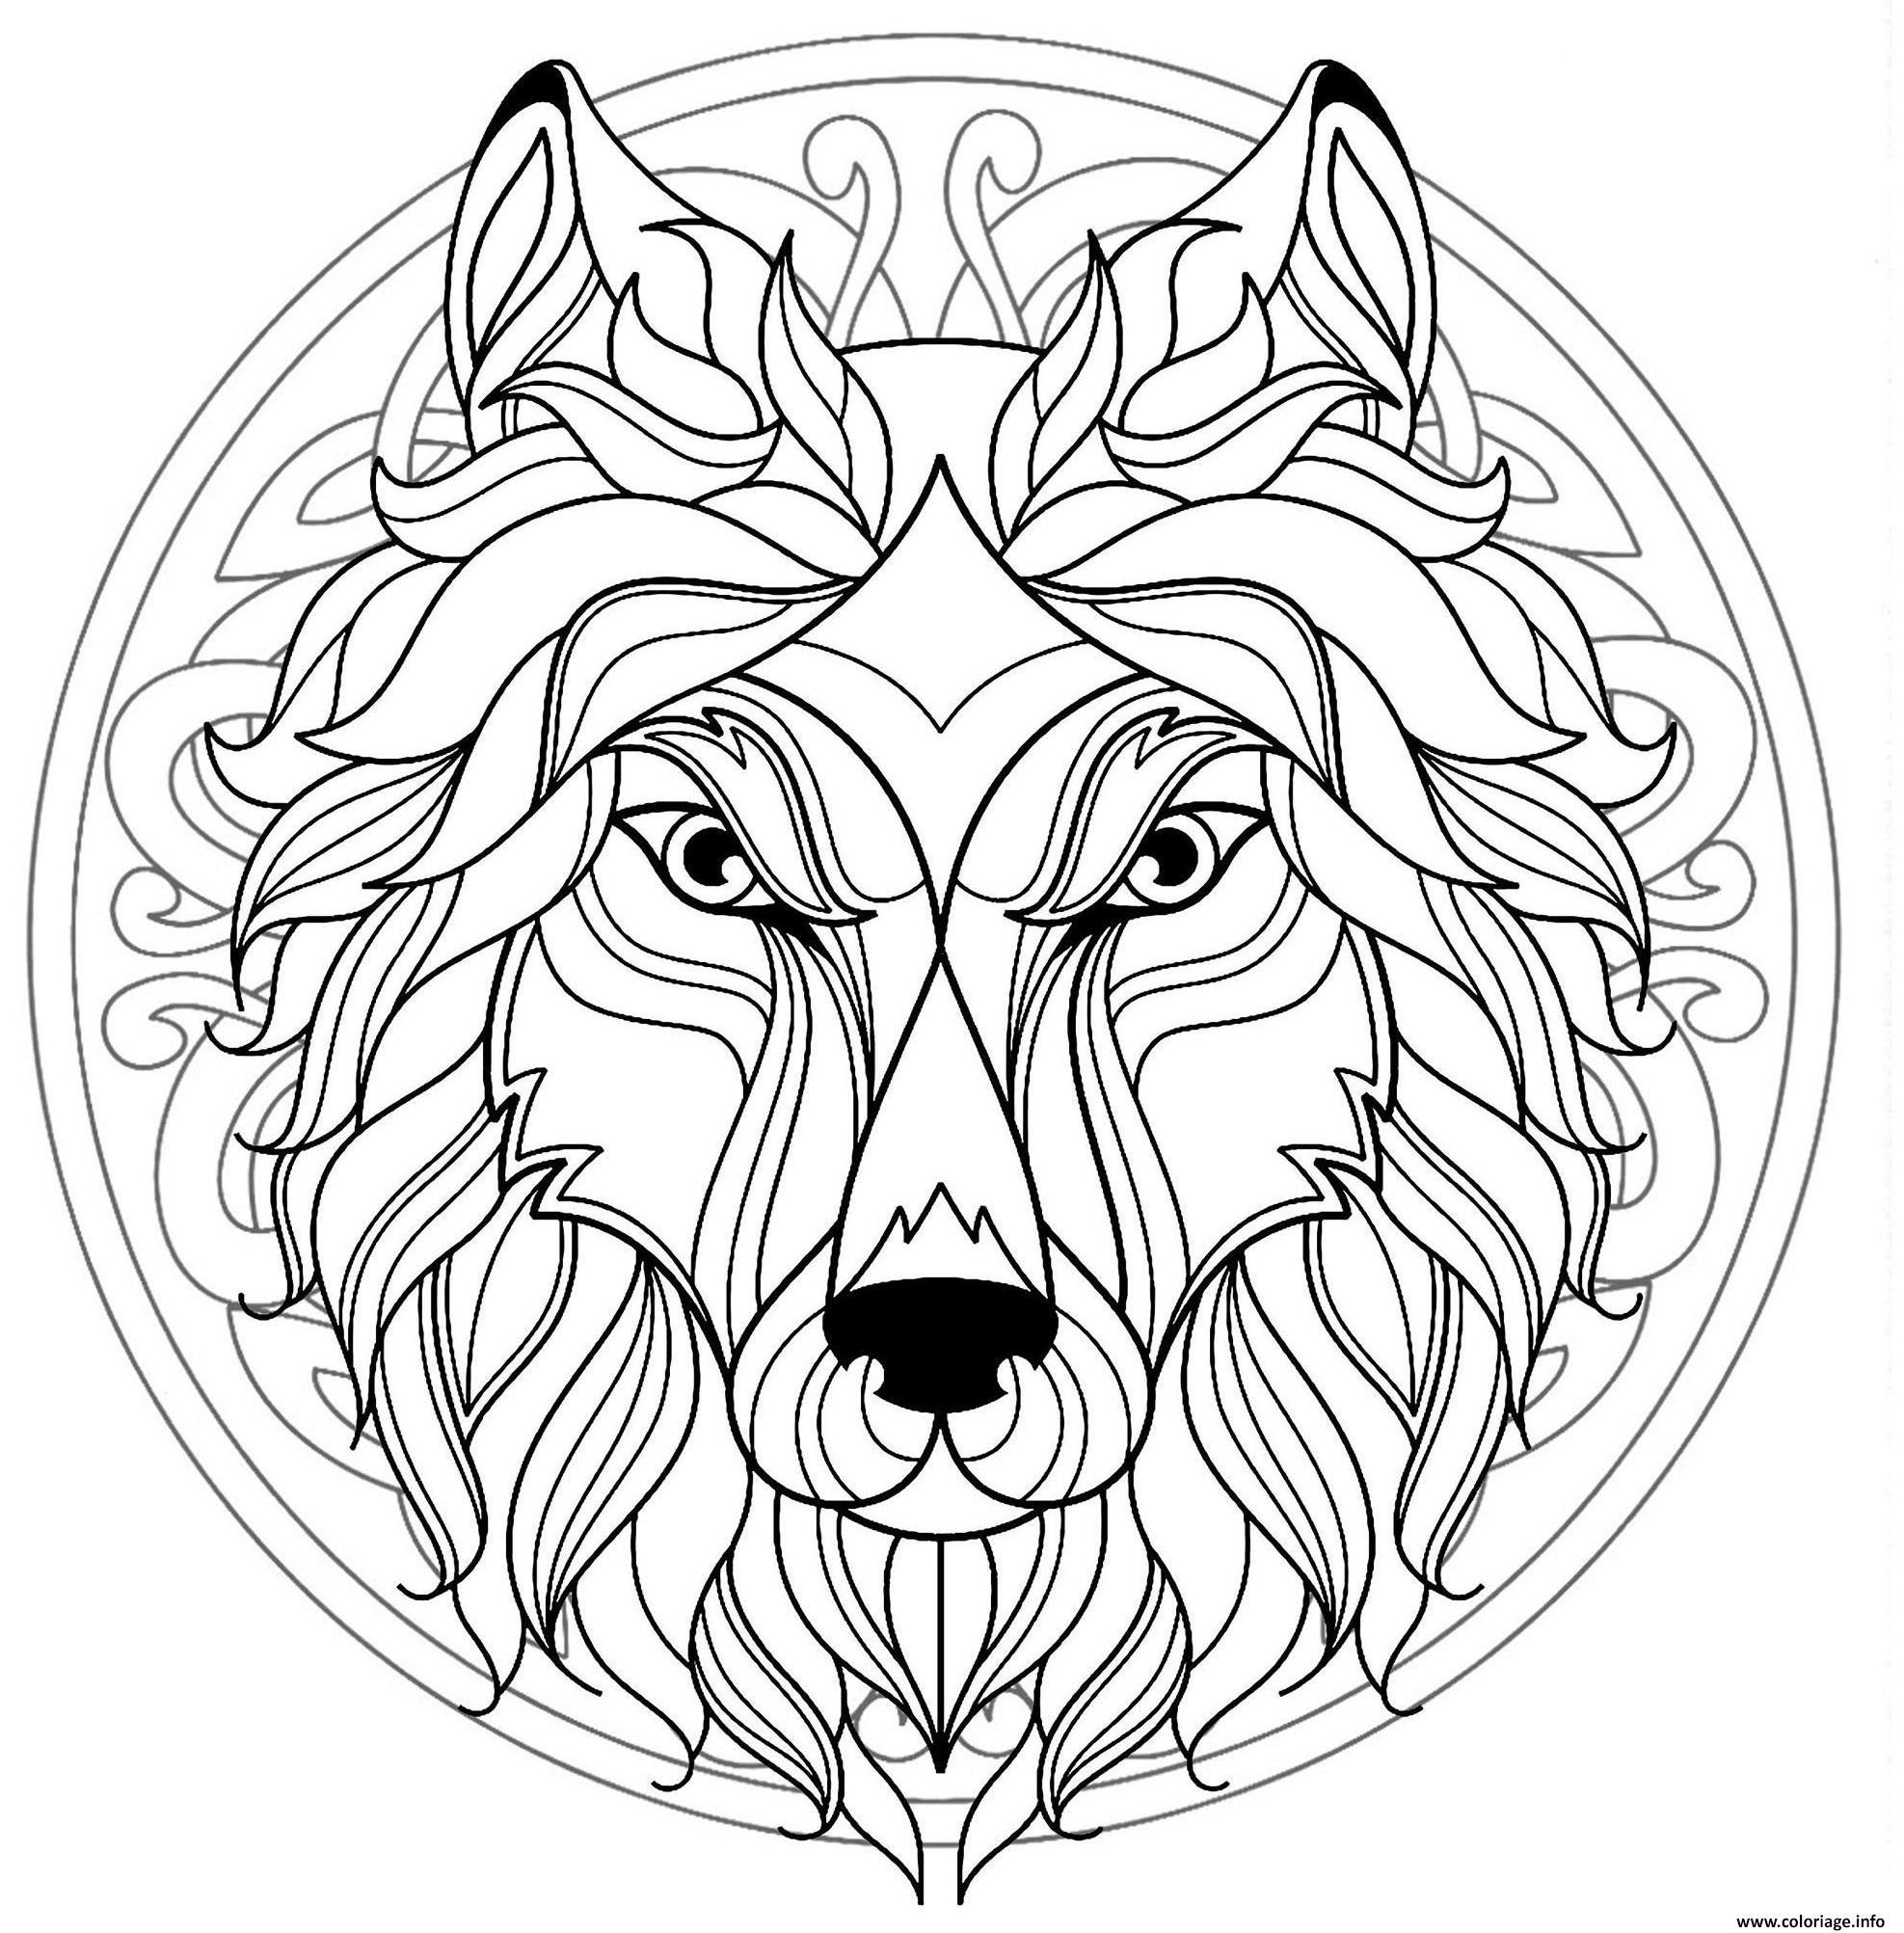 Coloriage Mandala Tete Loup Canis Lupus Dessin Mandala ...